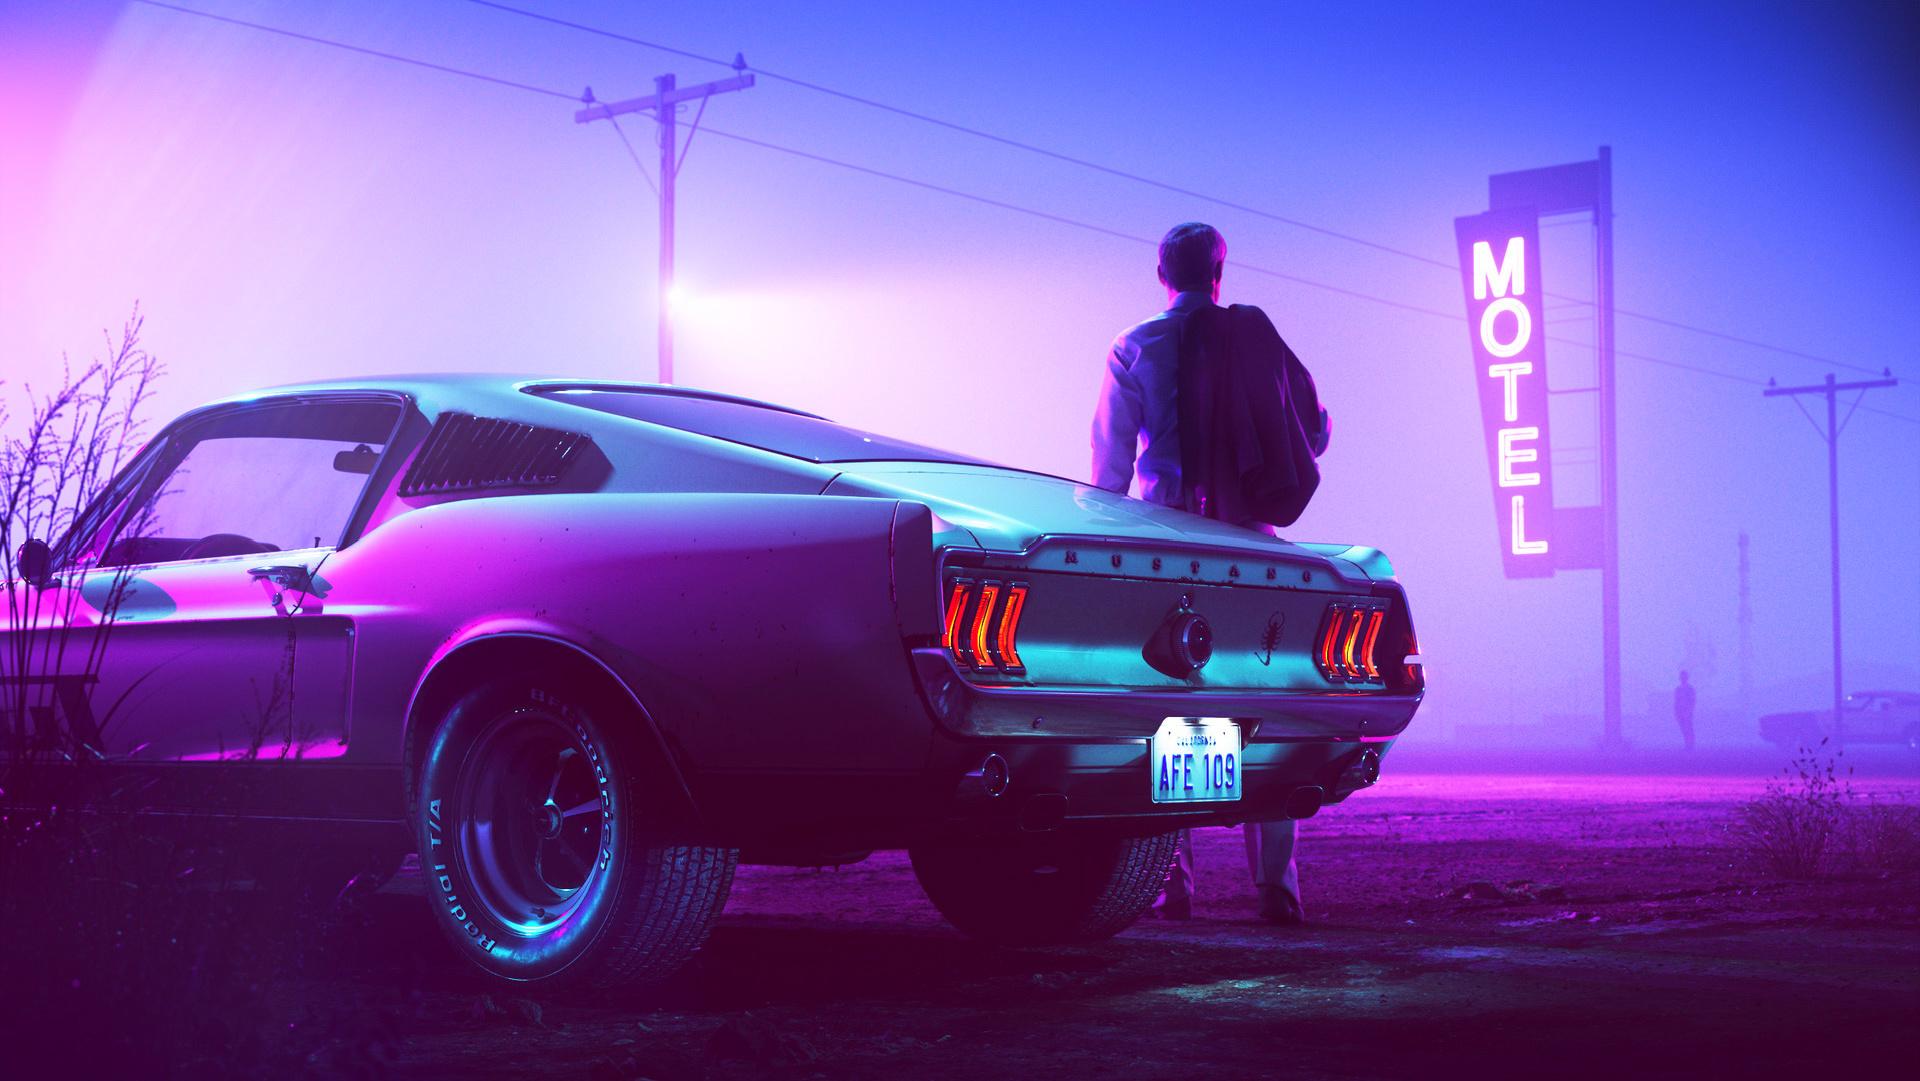 General 1920x1081 car Drive (movie) Ford Ford Mustang men Colorsponge Carlos neon motel street road